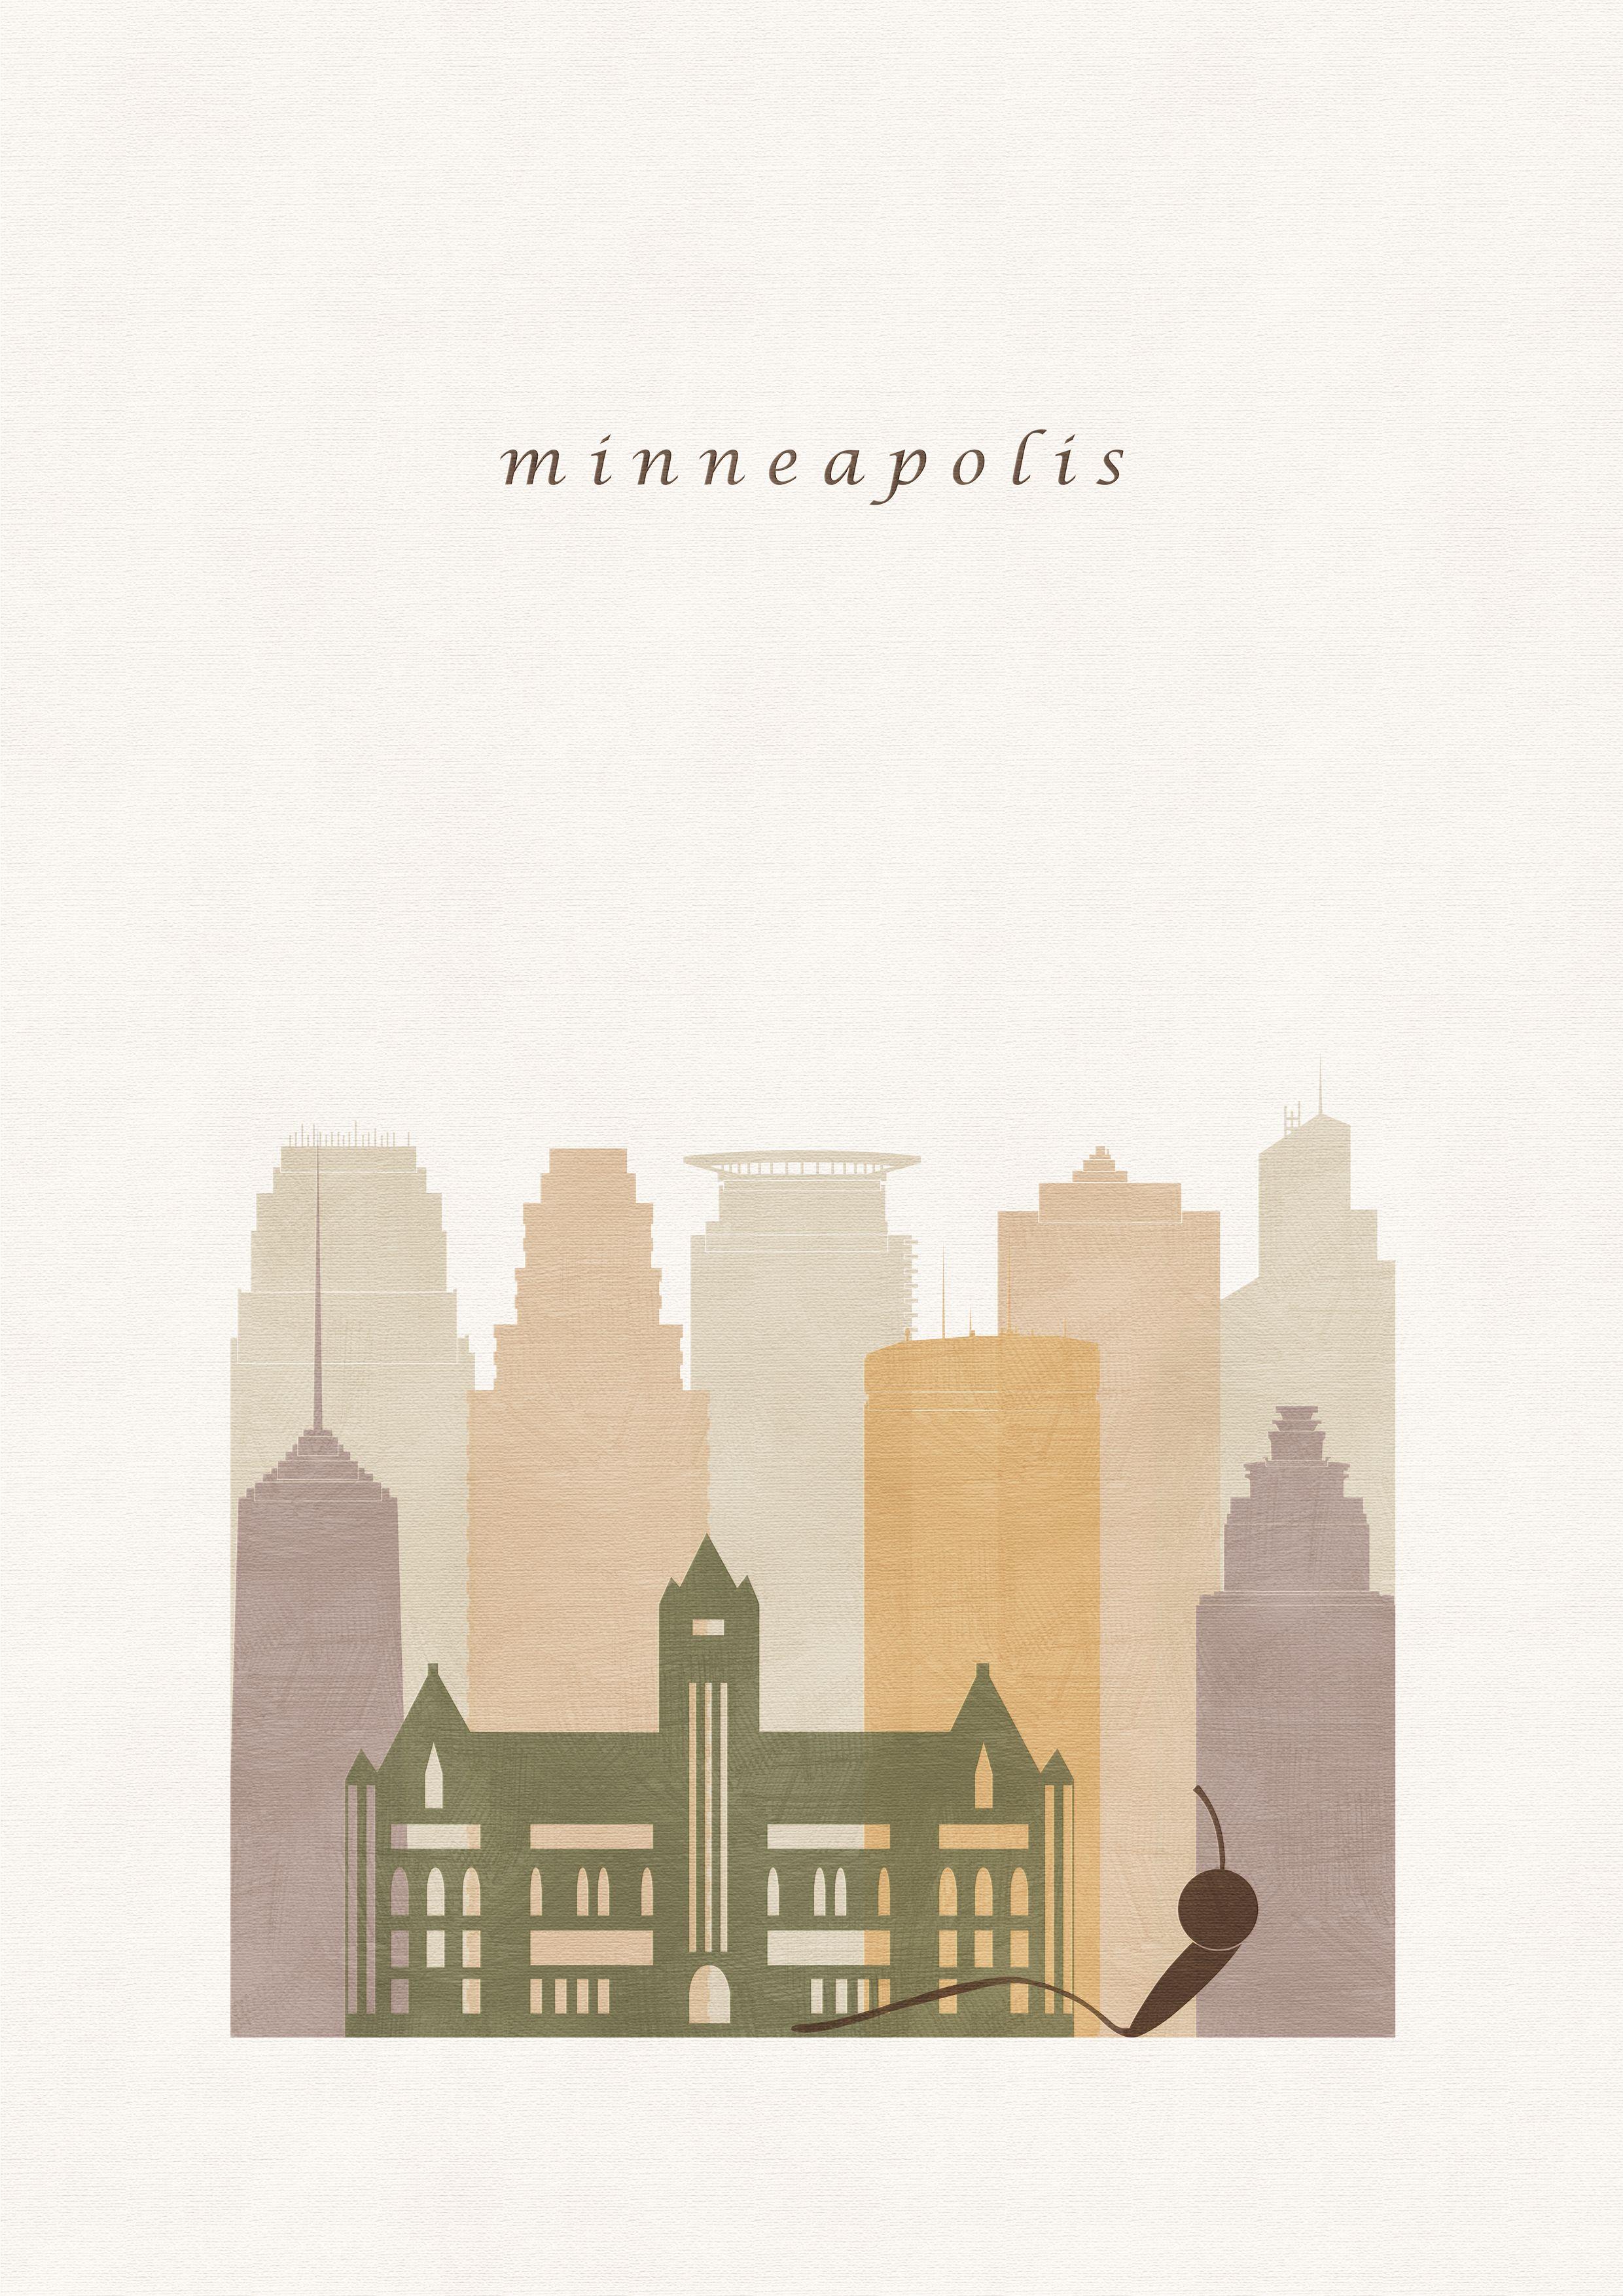 Minneapolis Art Mn Minneapolis Illustration Wall Art Prints Etsy Minimalist Art Print City Prints Travel Artwork